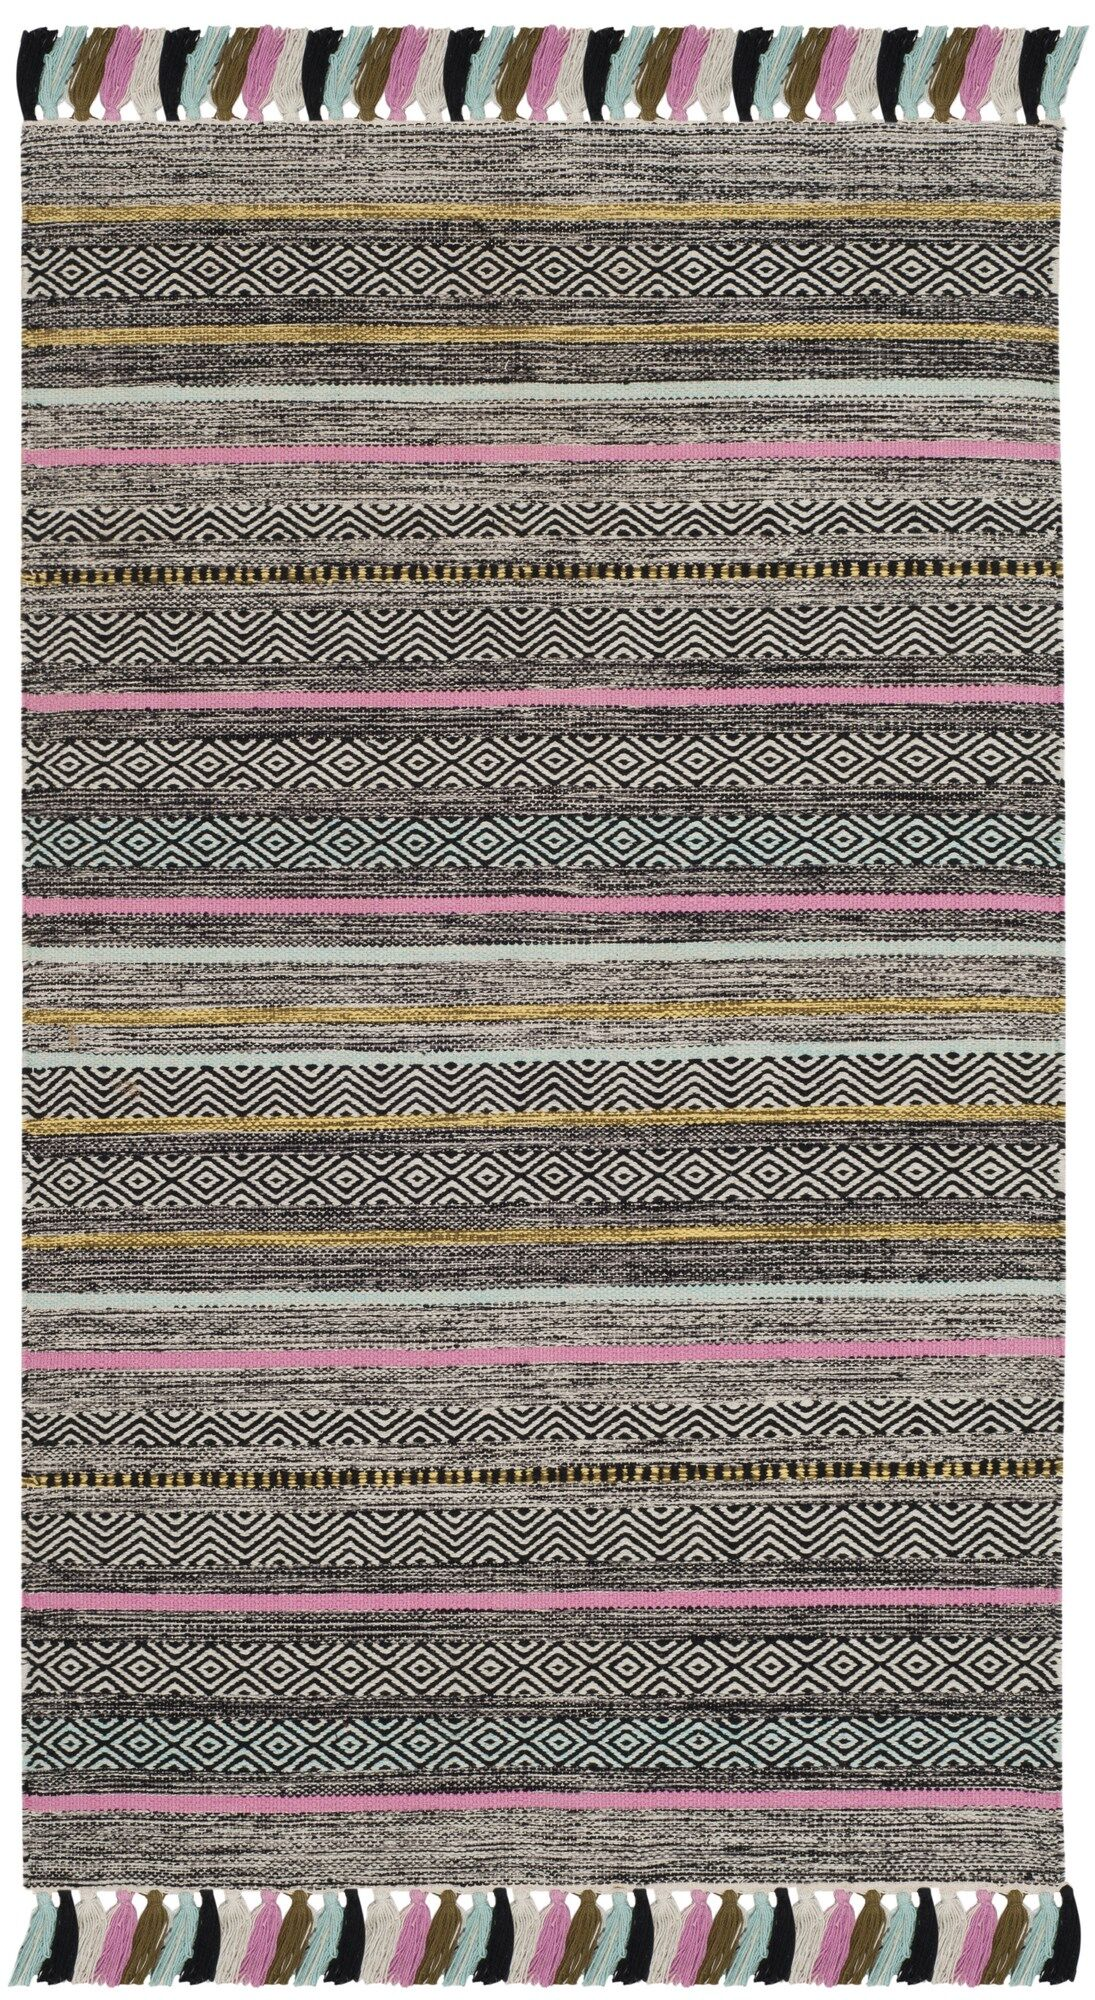 Trenton Hand-Woven Cotton Black Area Rug Rug Size: Rectangle 8' x 10'